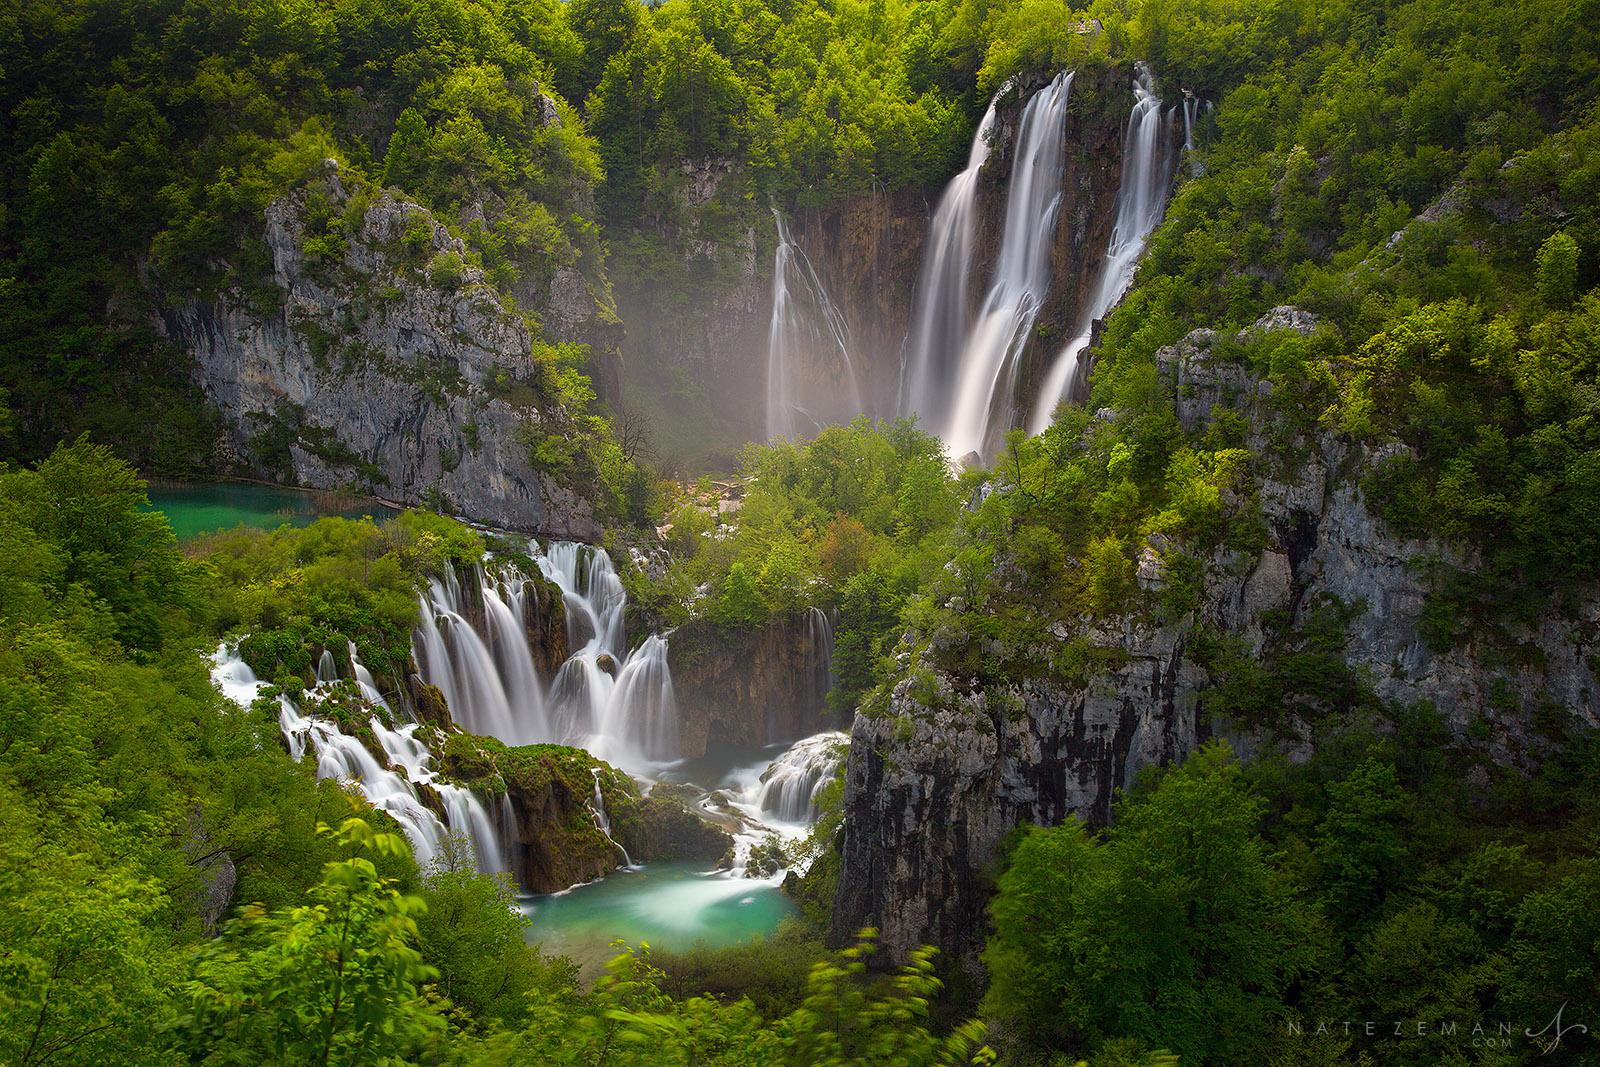 plitvice lakes, plitvice national park, waterfalls, falls, cascades, croatia, waterfall, plitvika, , photo